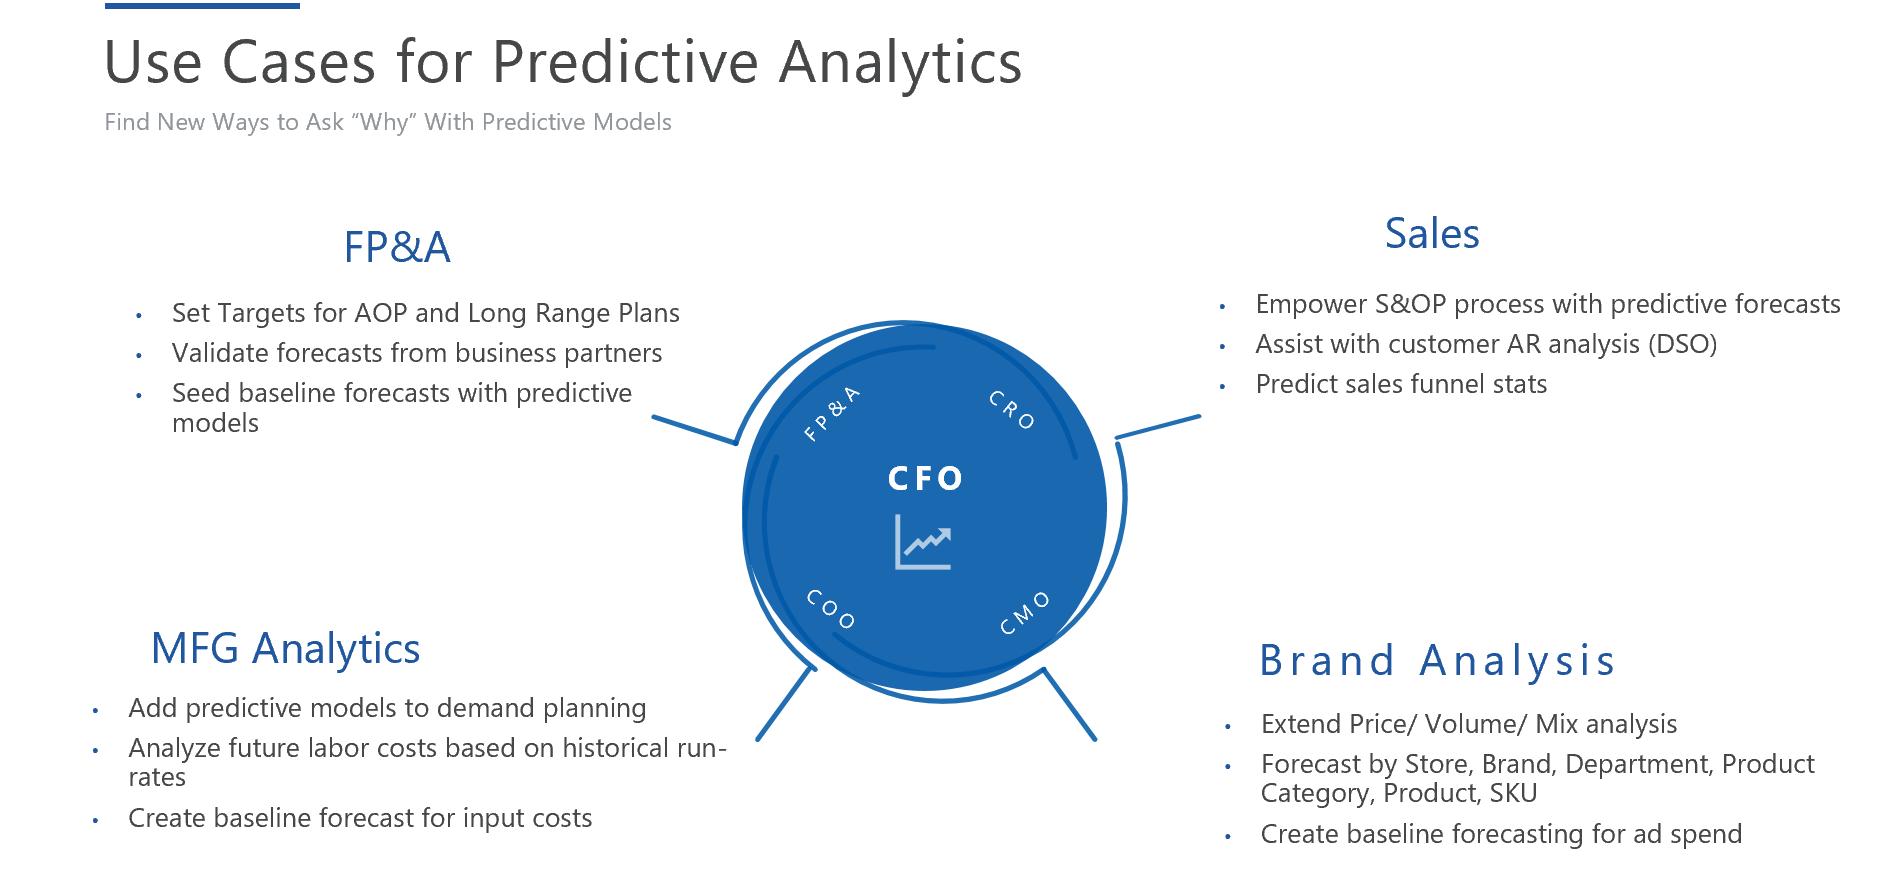 Use Cases for Predictive Analytics